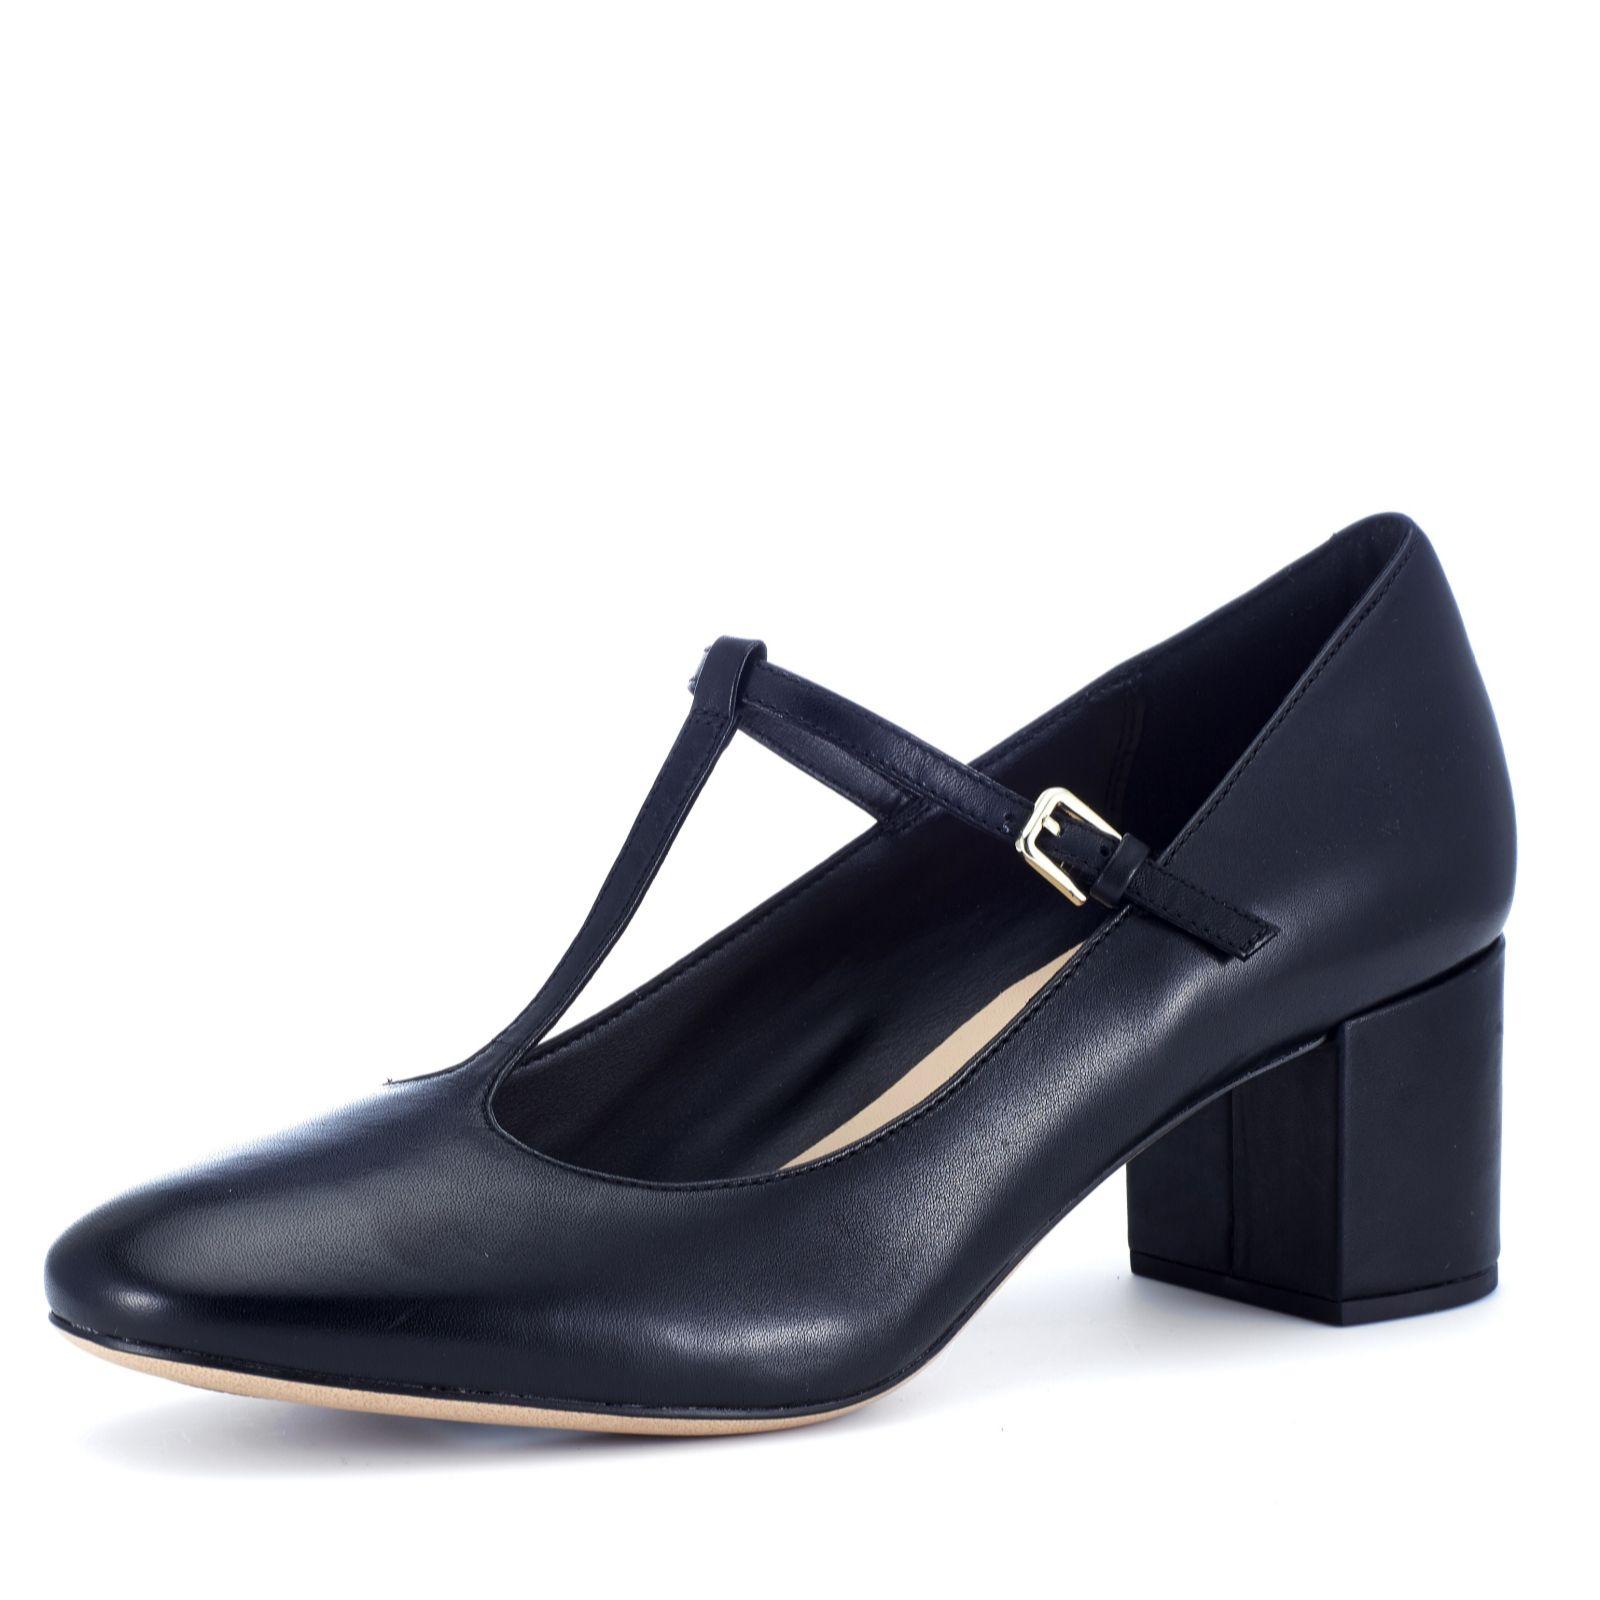 Clarks Kelda Hope Pewter Metallic, Schuhe, Absatzschuhe, Pumps, Lila, Female, 36